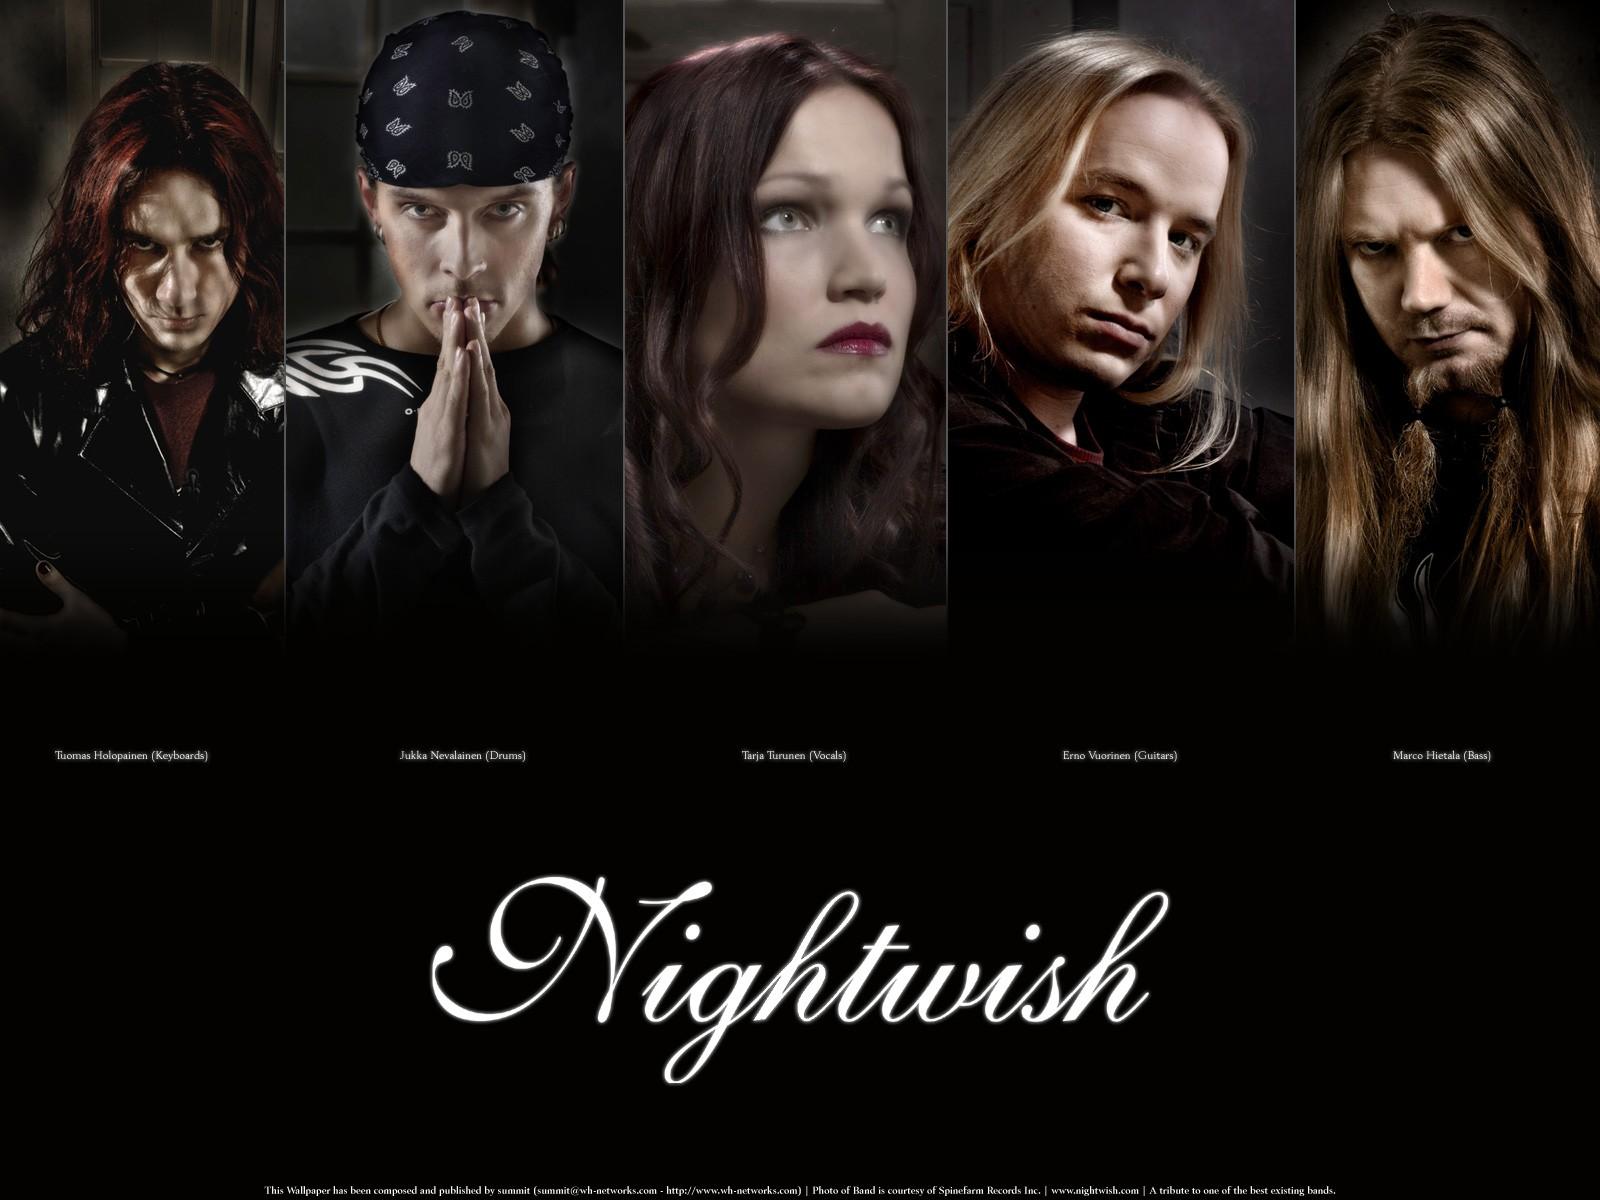 http://2.bp.blogspot.com/-PuvITylKsQs/TZNzDMrcfPI/AAAAAAAAAHE/RaA6_en1xYg/s1600/Nightwish.jpg